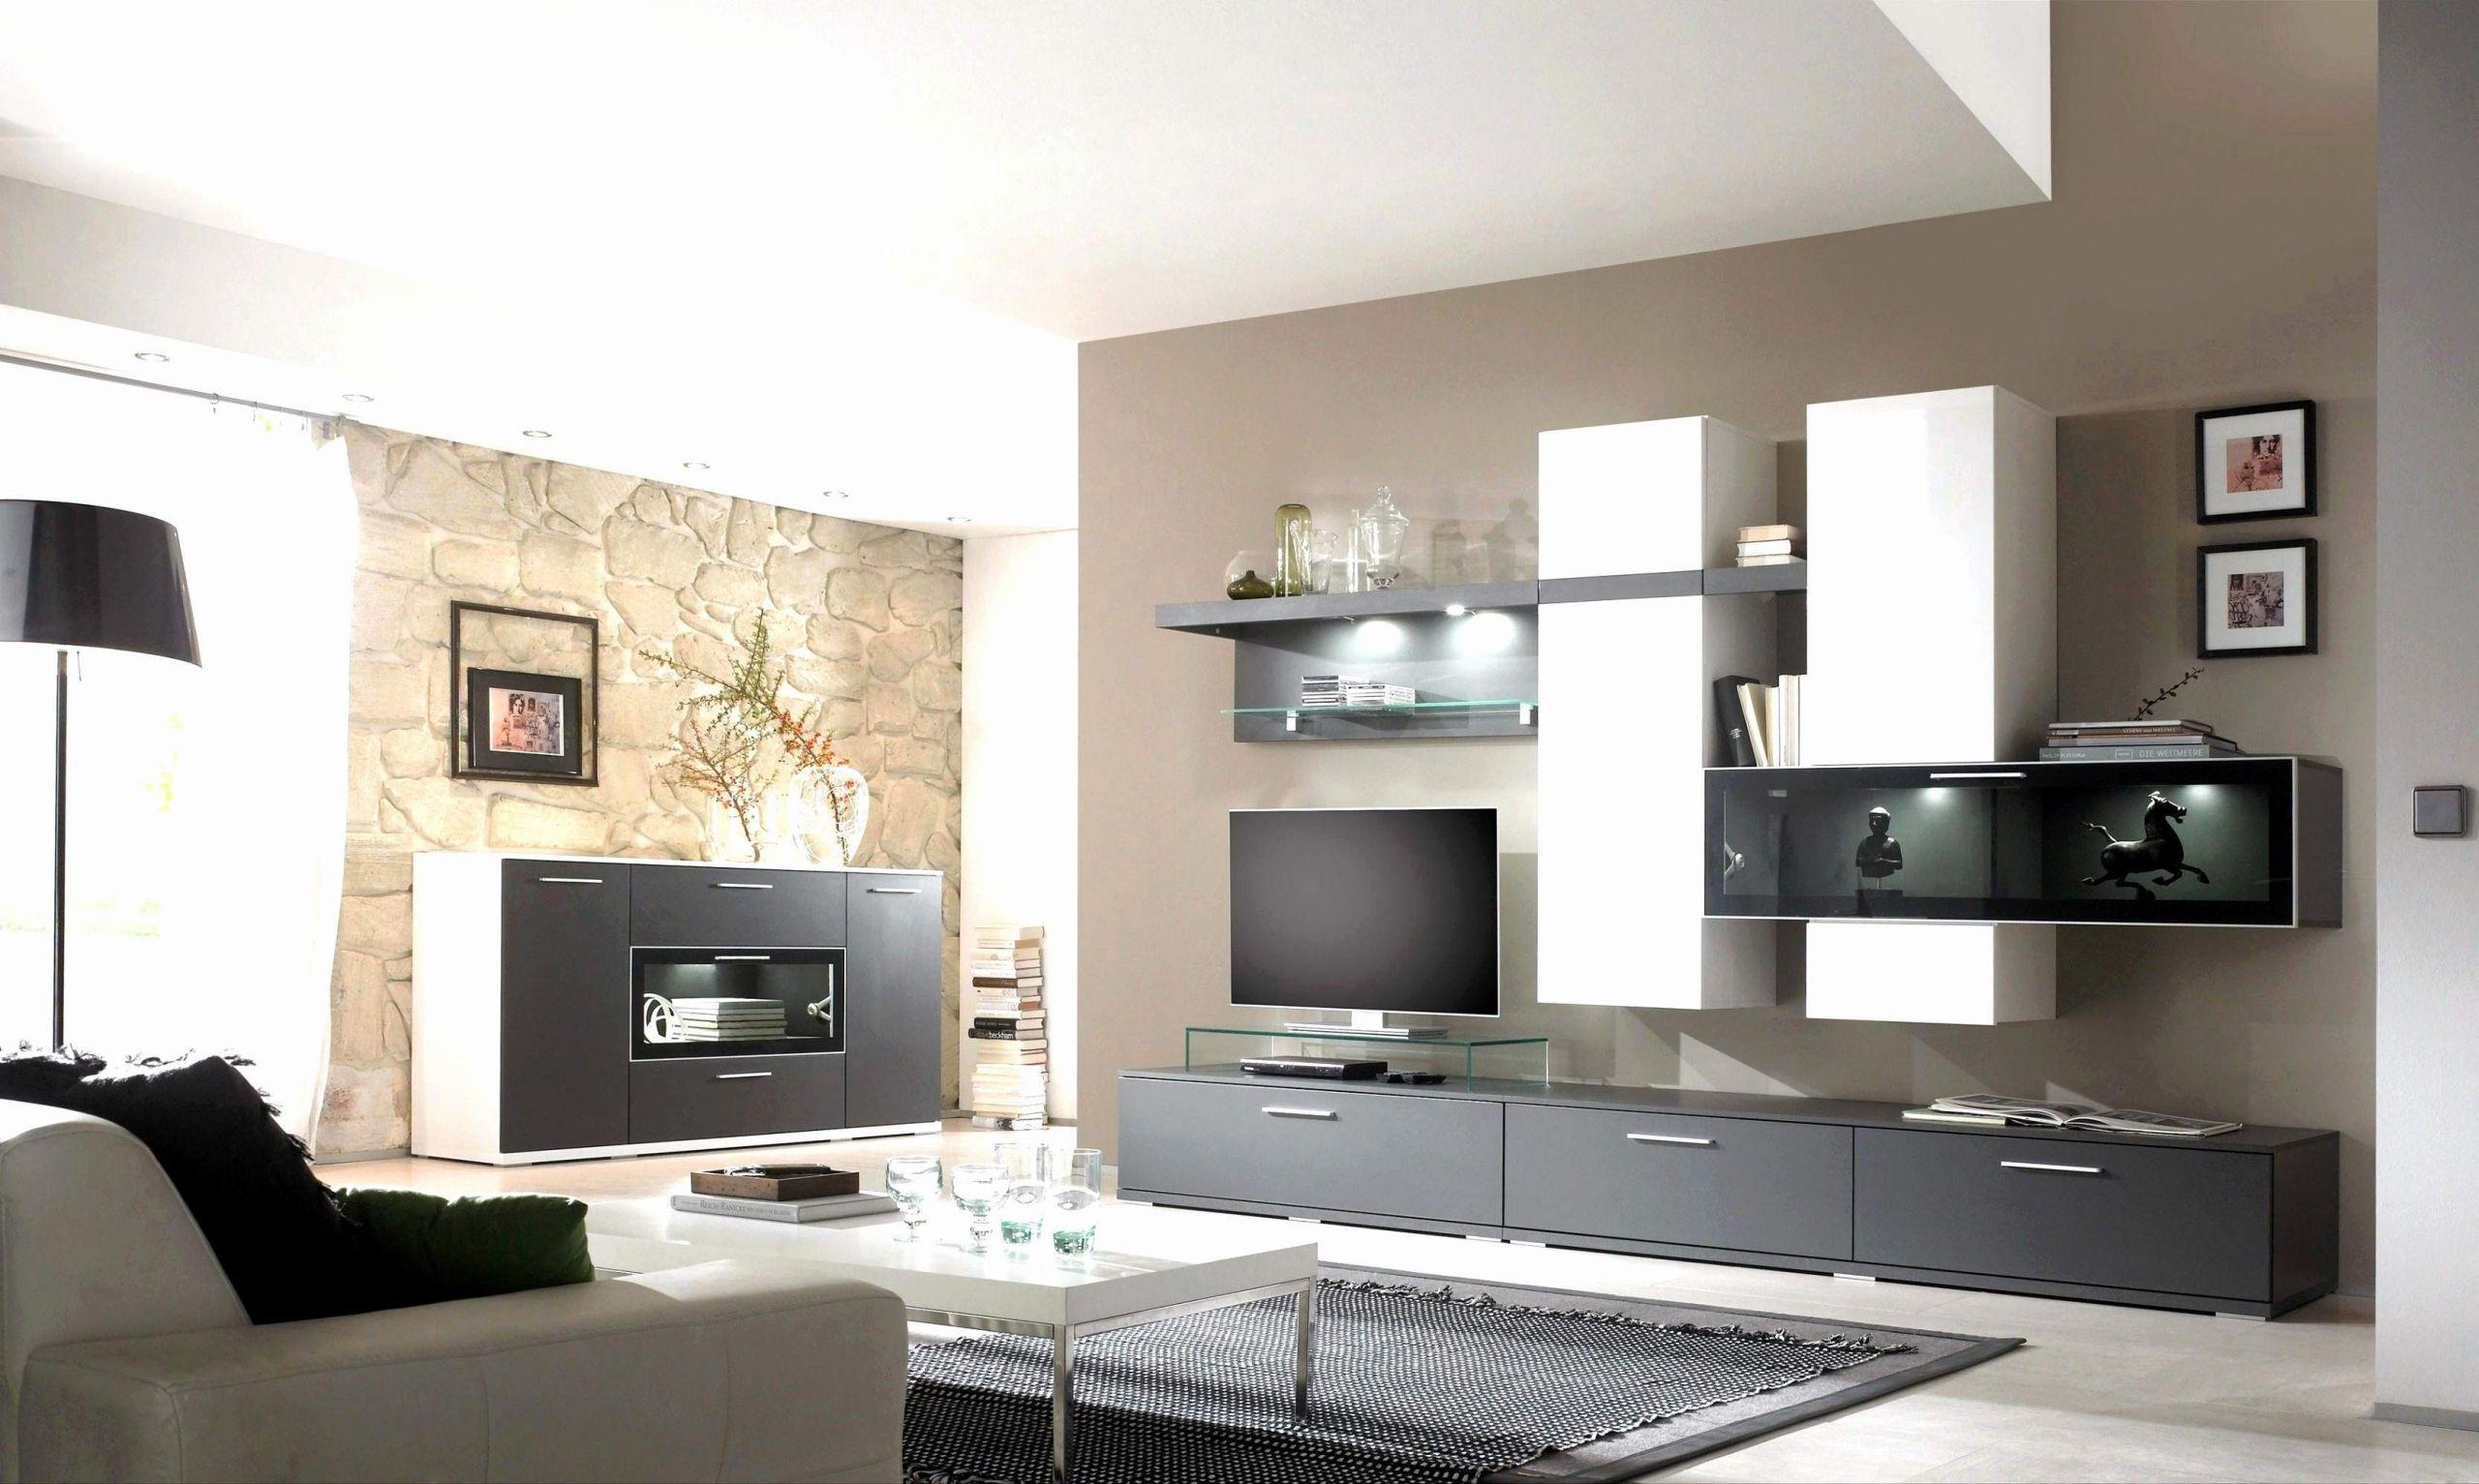 wandfarbe wohnzimmer feng shui neu 29 das beste von wandfarbe wohnzimmer feng shui of wandfarbe wohnzimmer feng shui